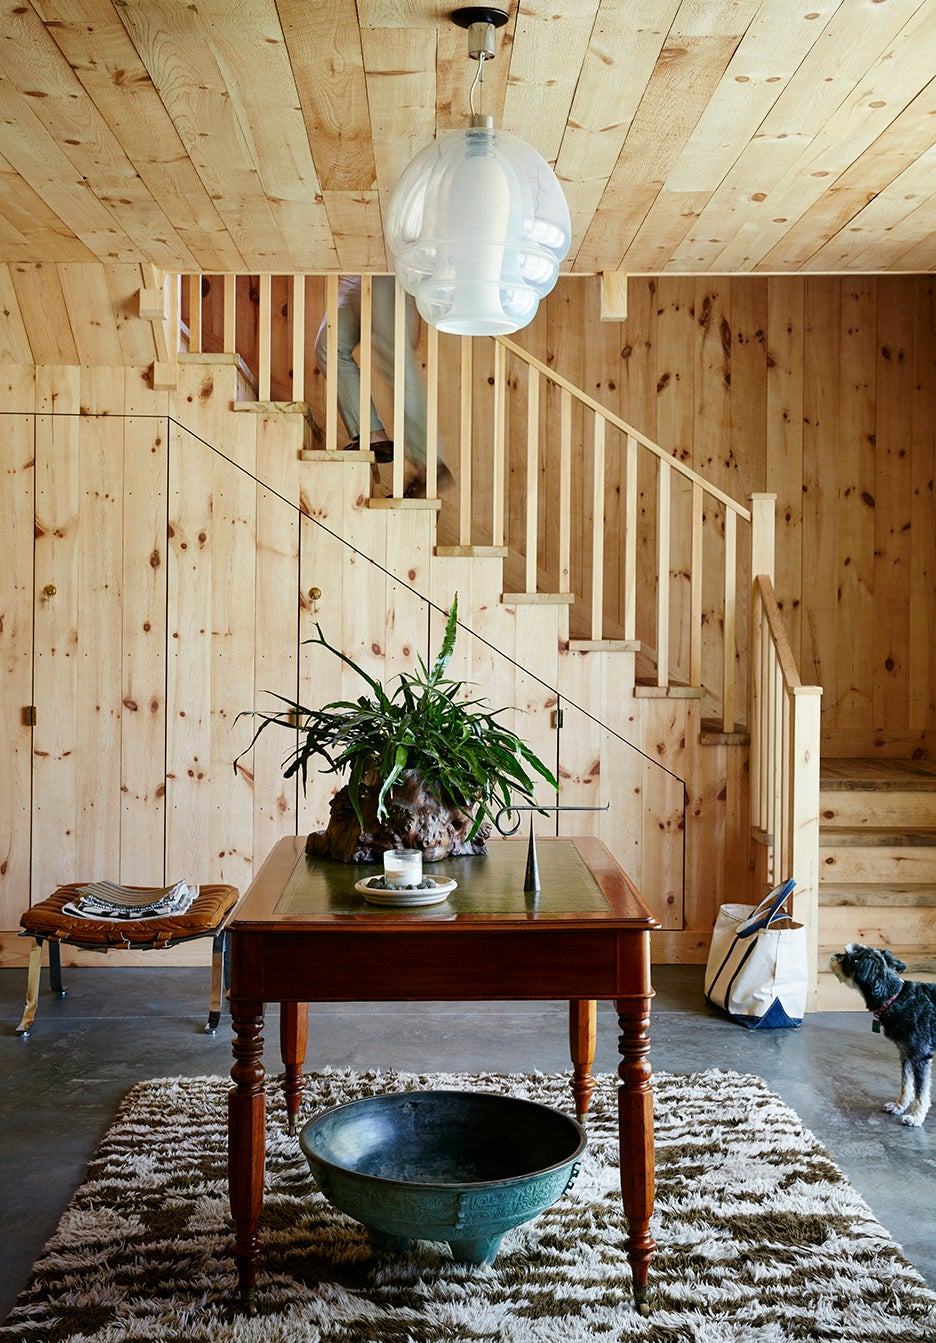 Wood-paneled mudroom with concrete floors